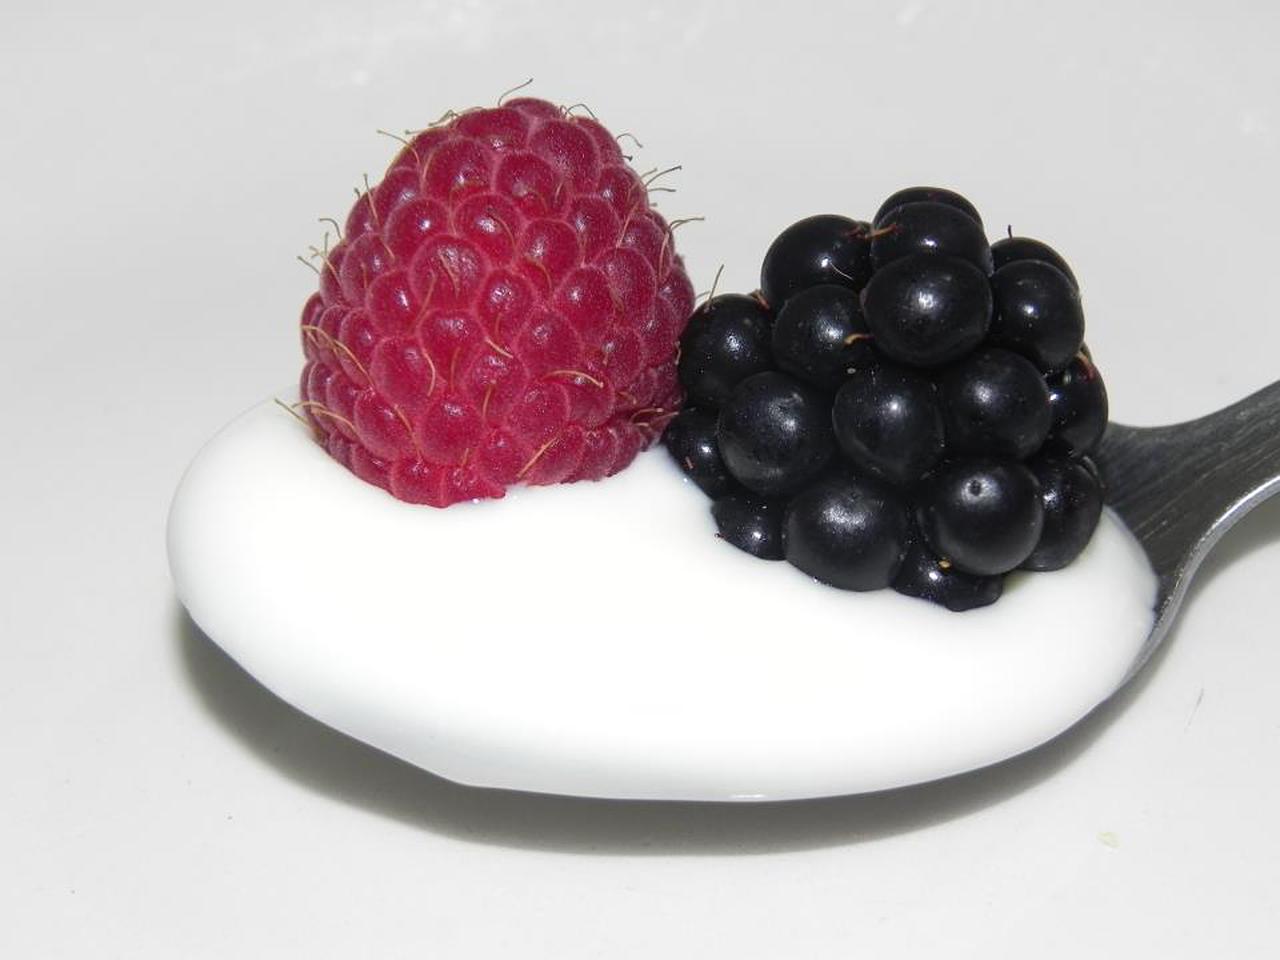 Plain yogurt with Berries -  PixelBay